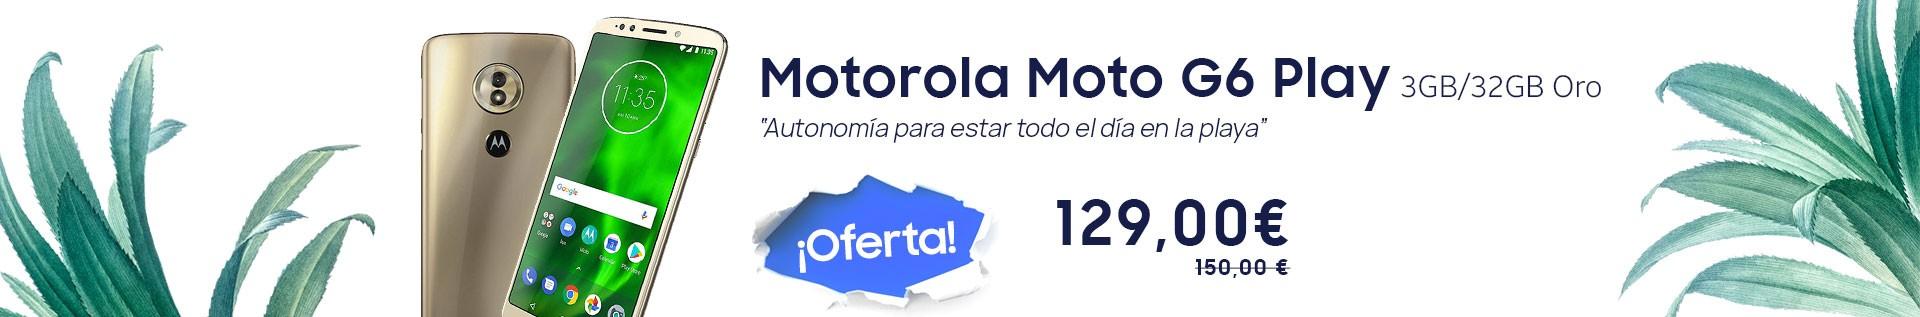 Comprar Motorola Moto